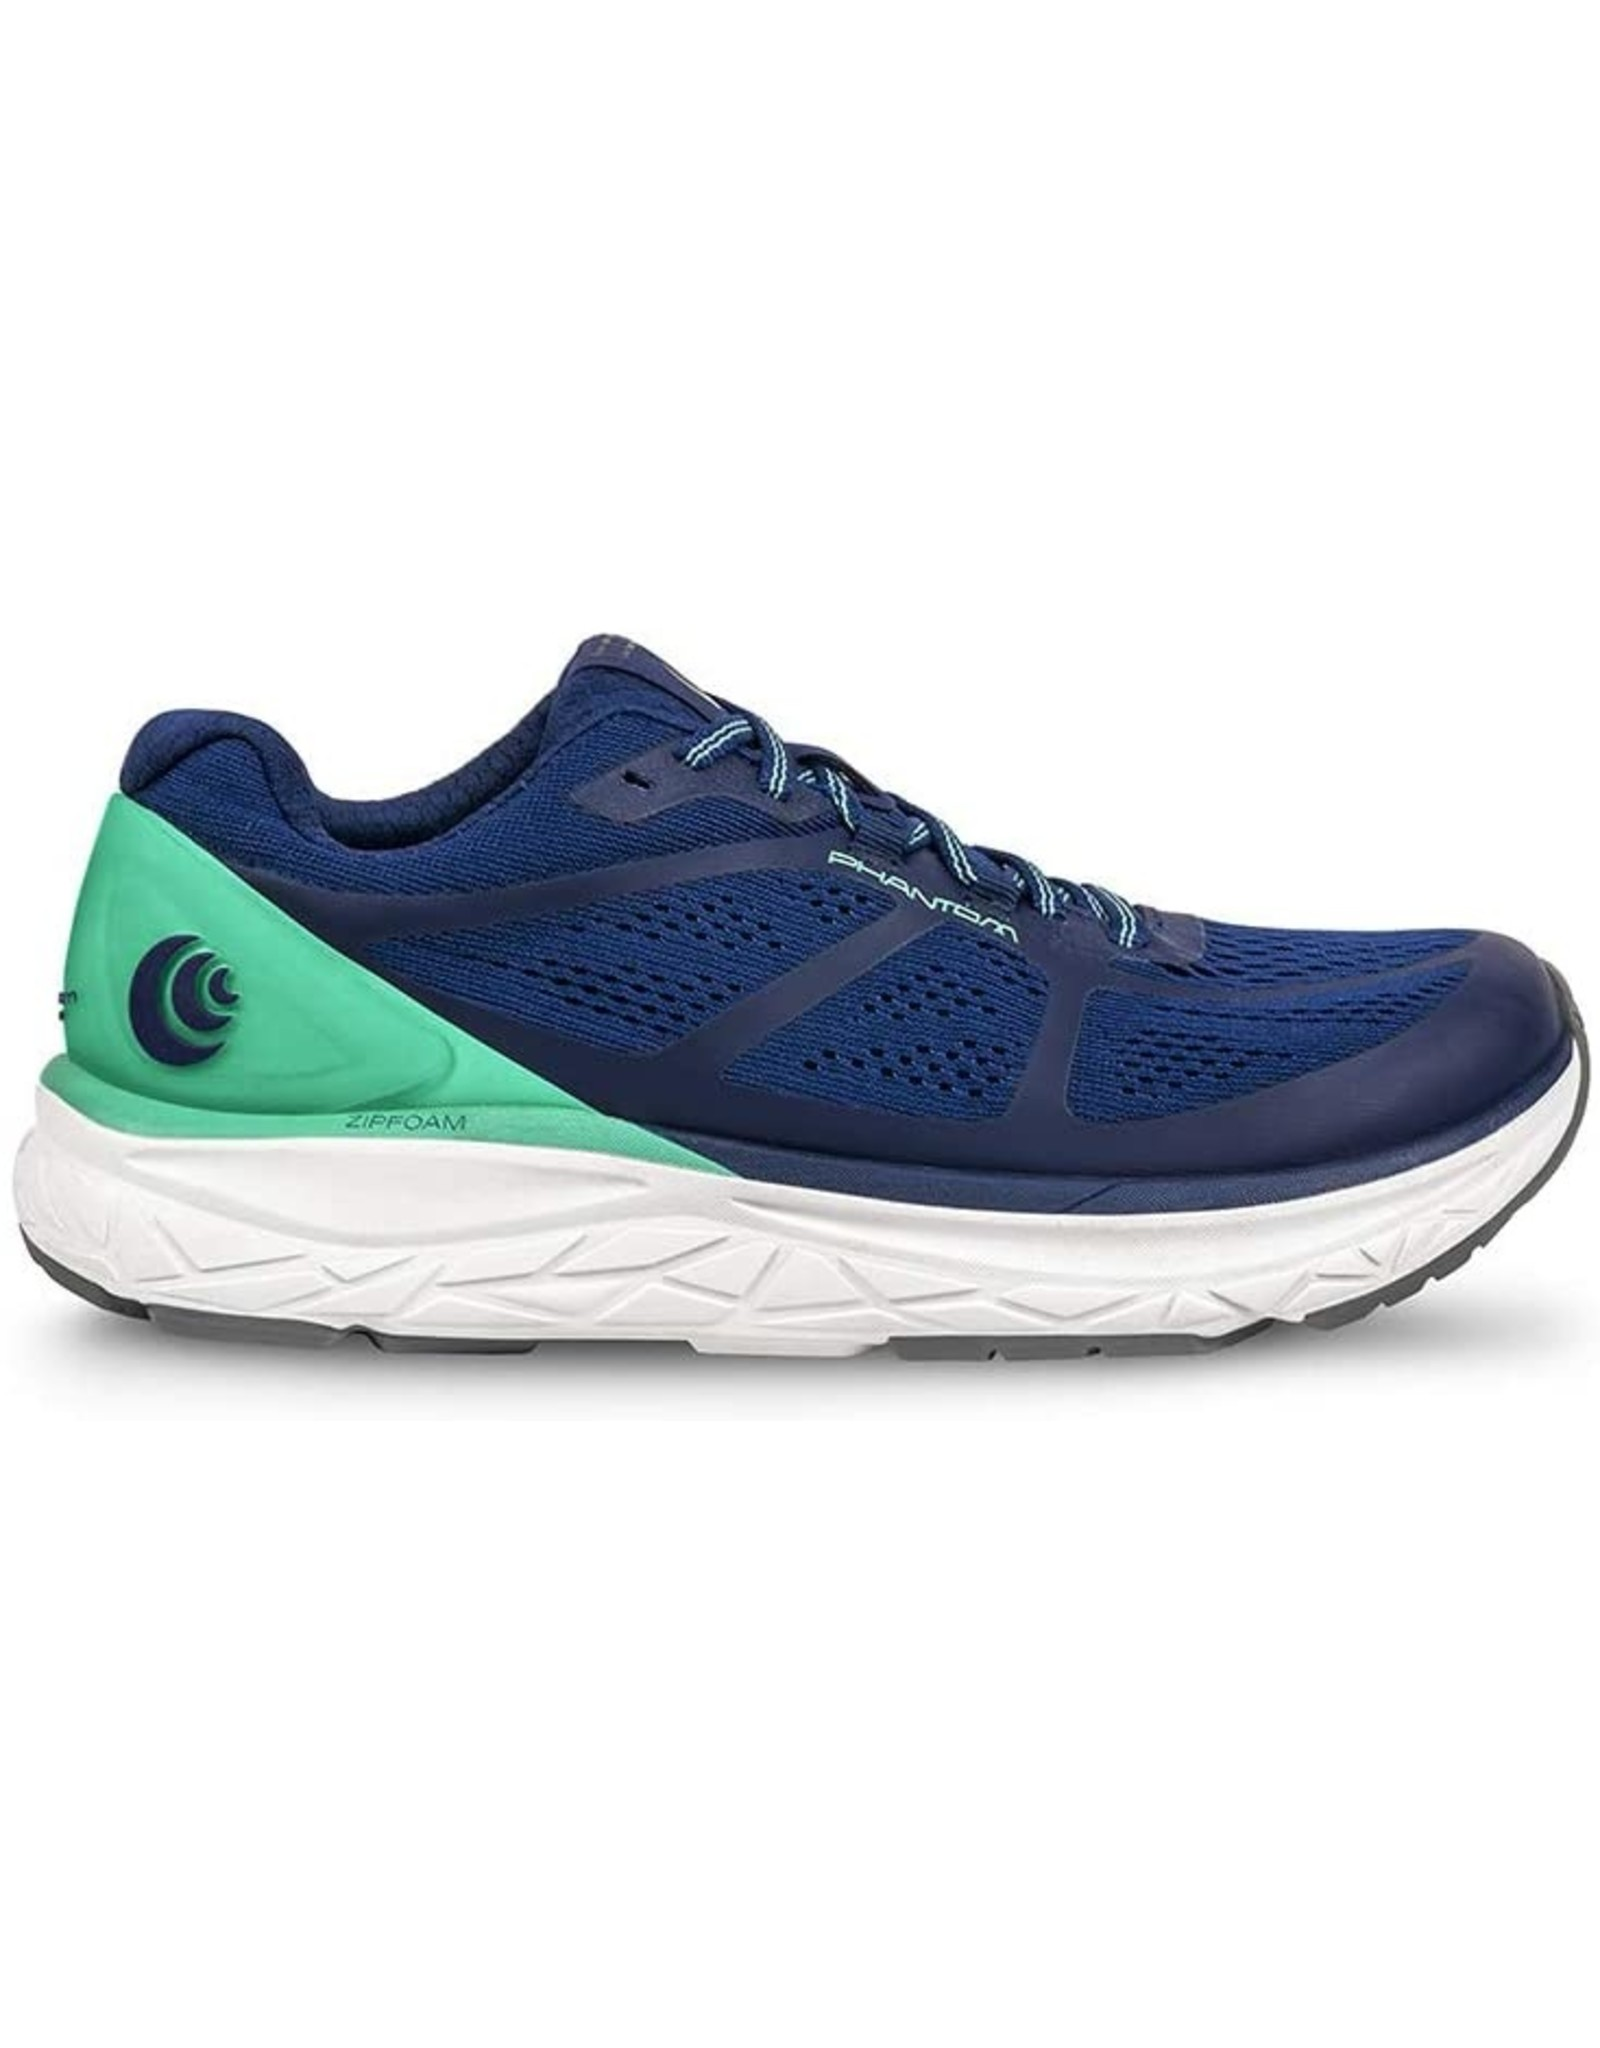 Topo Athletic Phantom Women's Road Running Shoe Cobalt / Seafoam Size 9.5